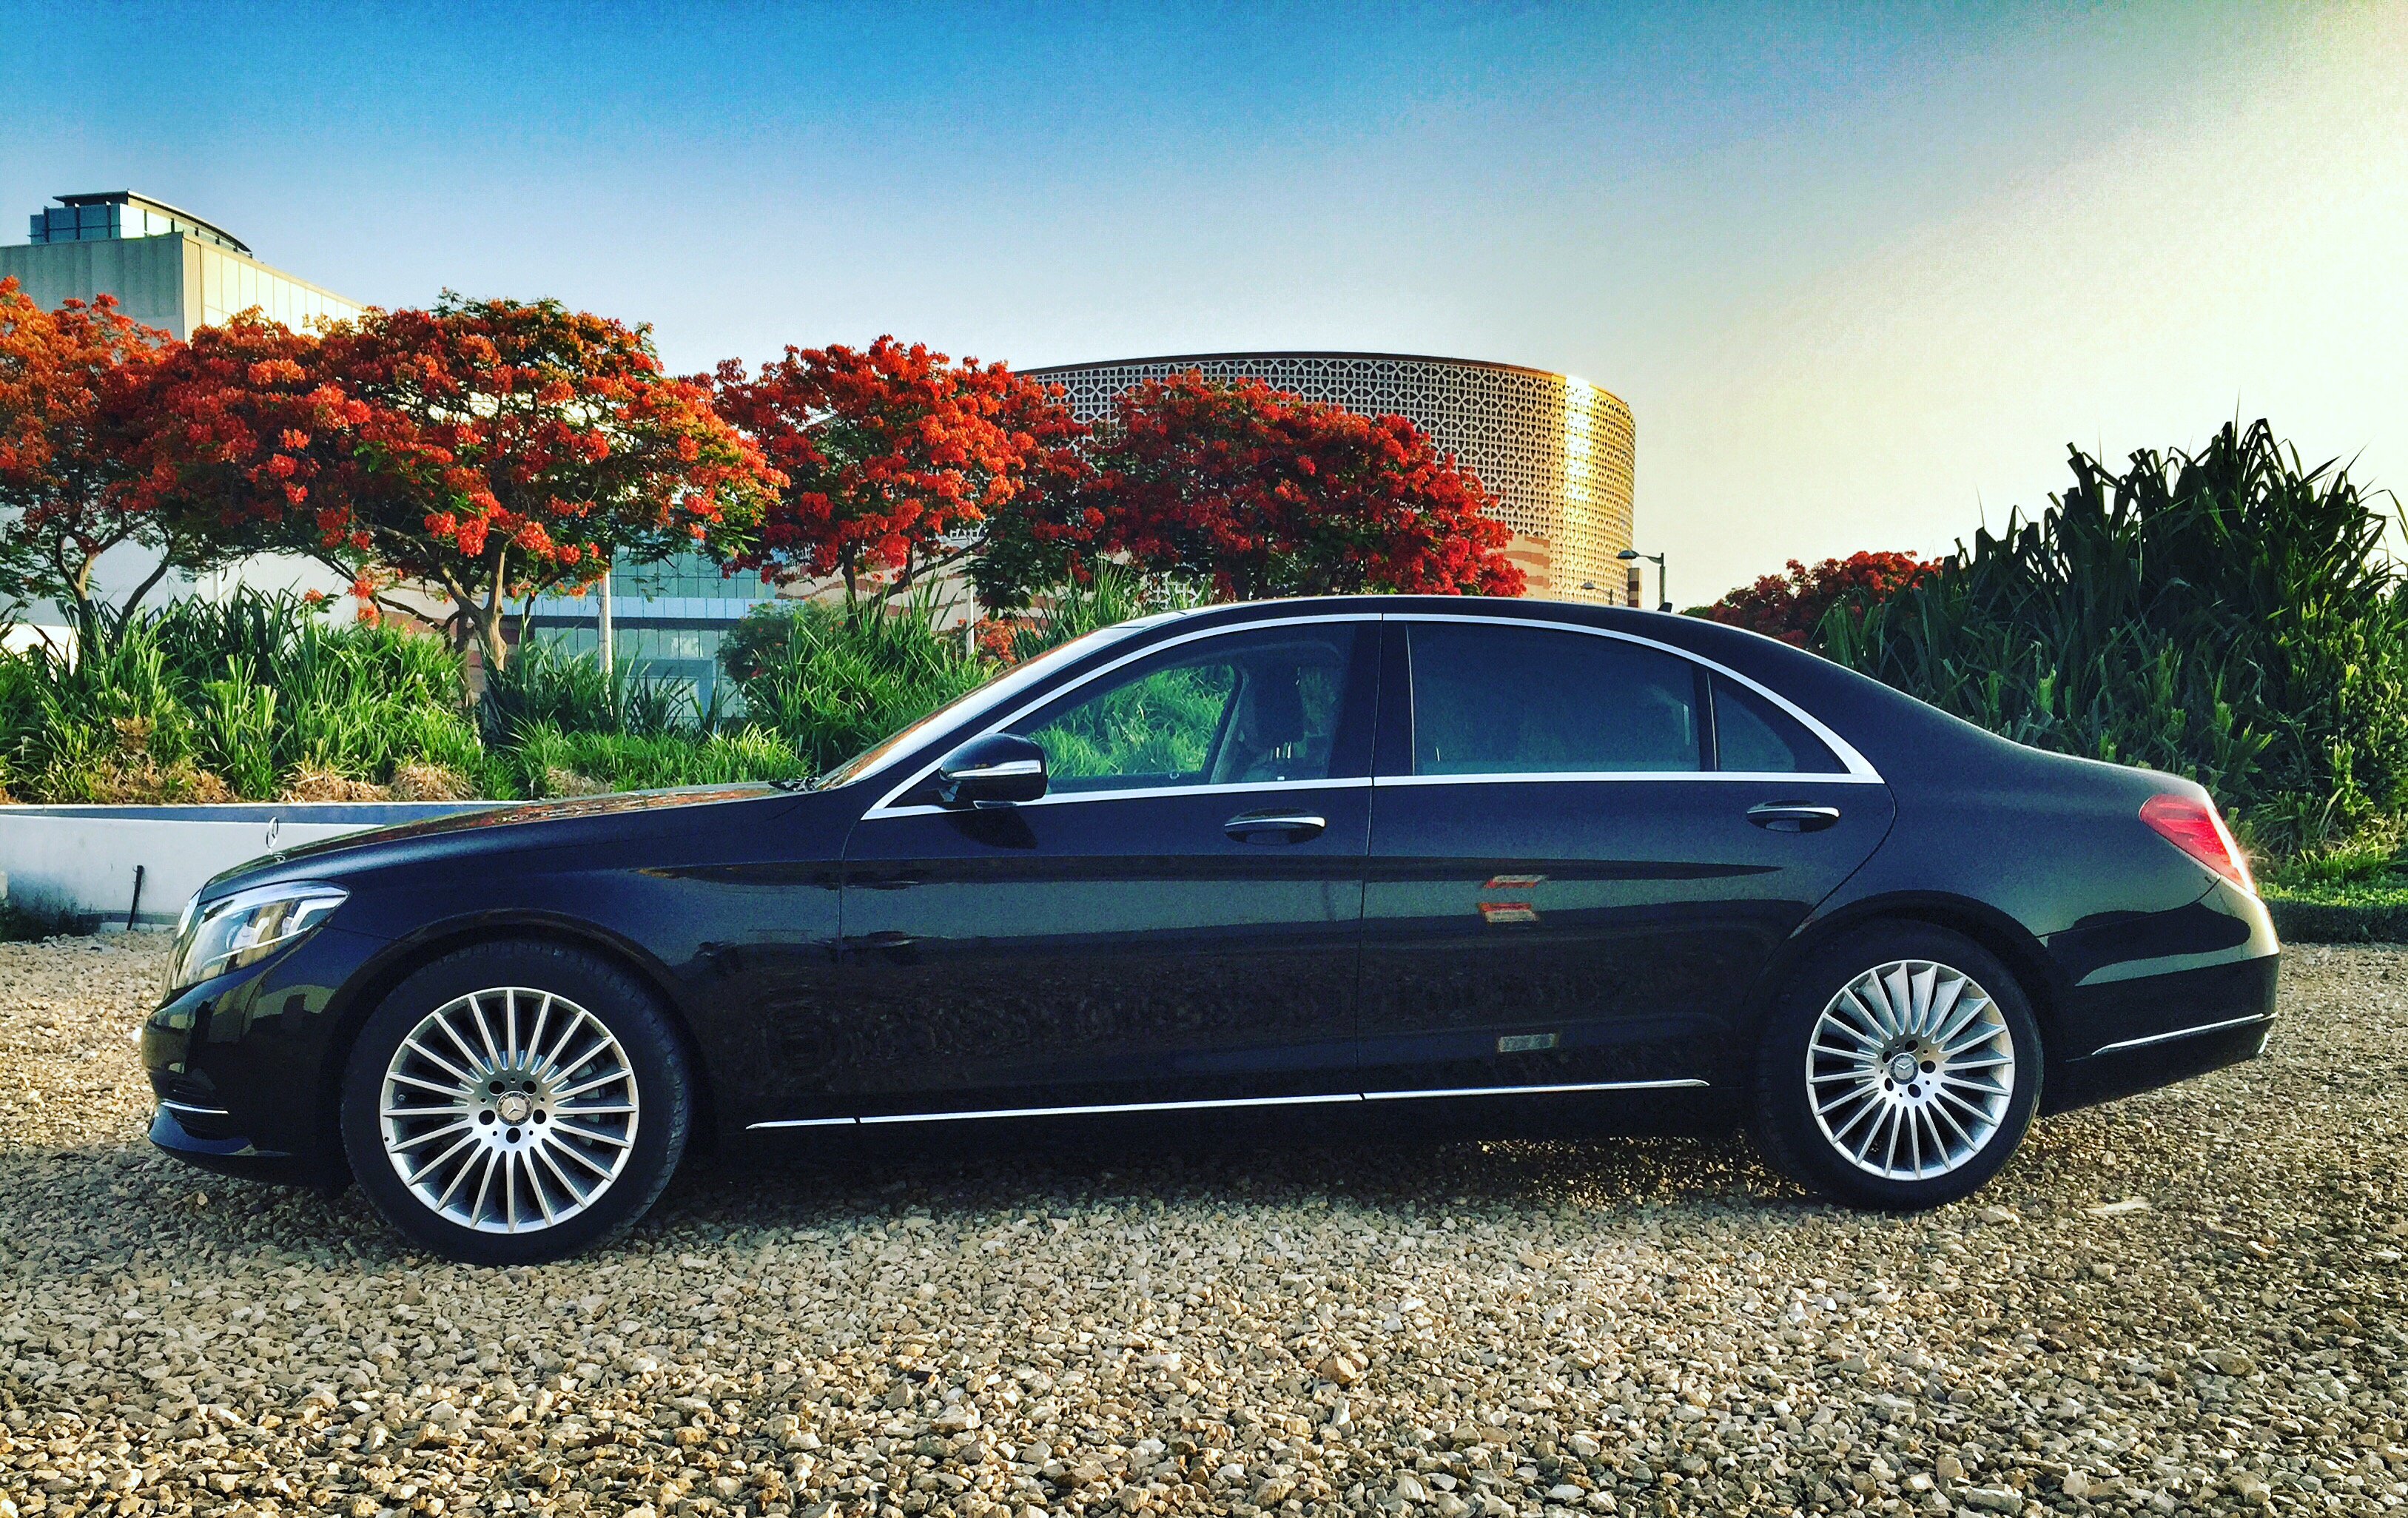 2016 Mercedes-Benz S400 - Side View - instagram.com/samisiddiqi1/